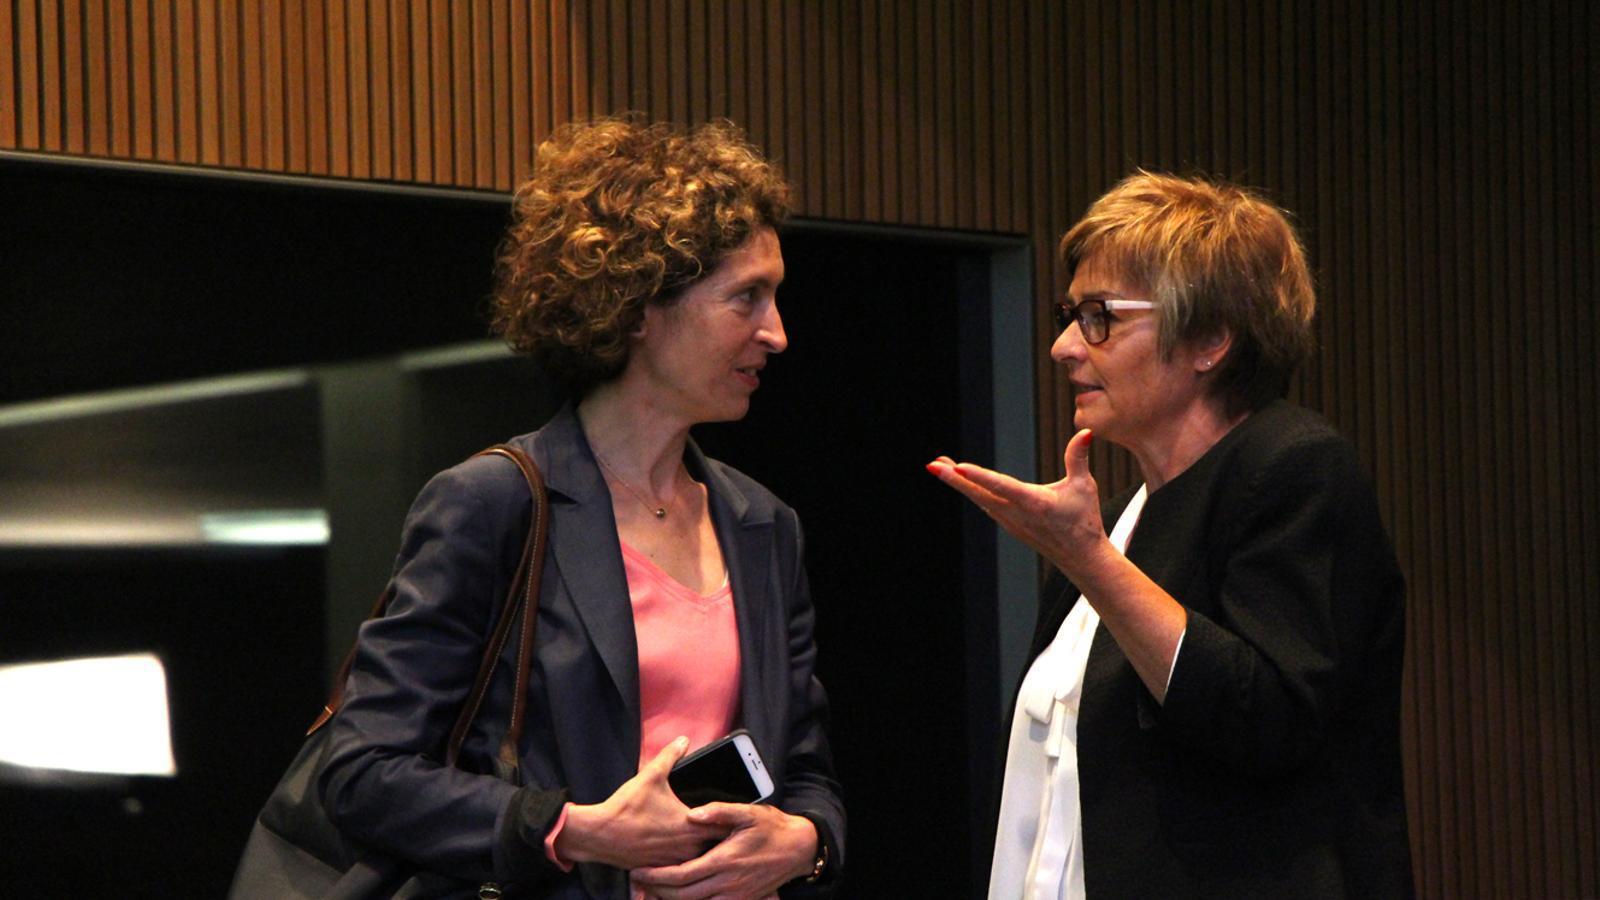 La ministra Maria Ubach conversa amb la consellera Meritxell Palmitjavila. / M. M. (ANA)